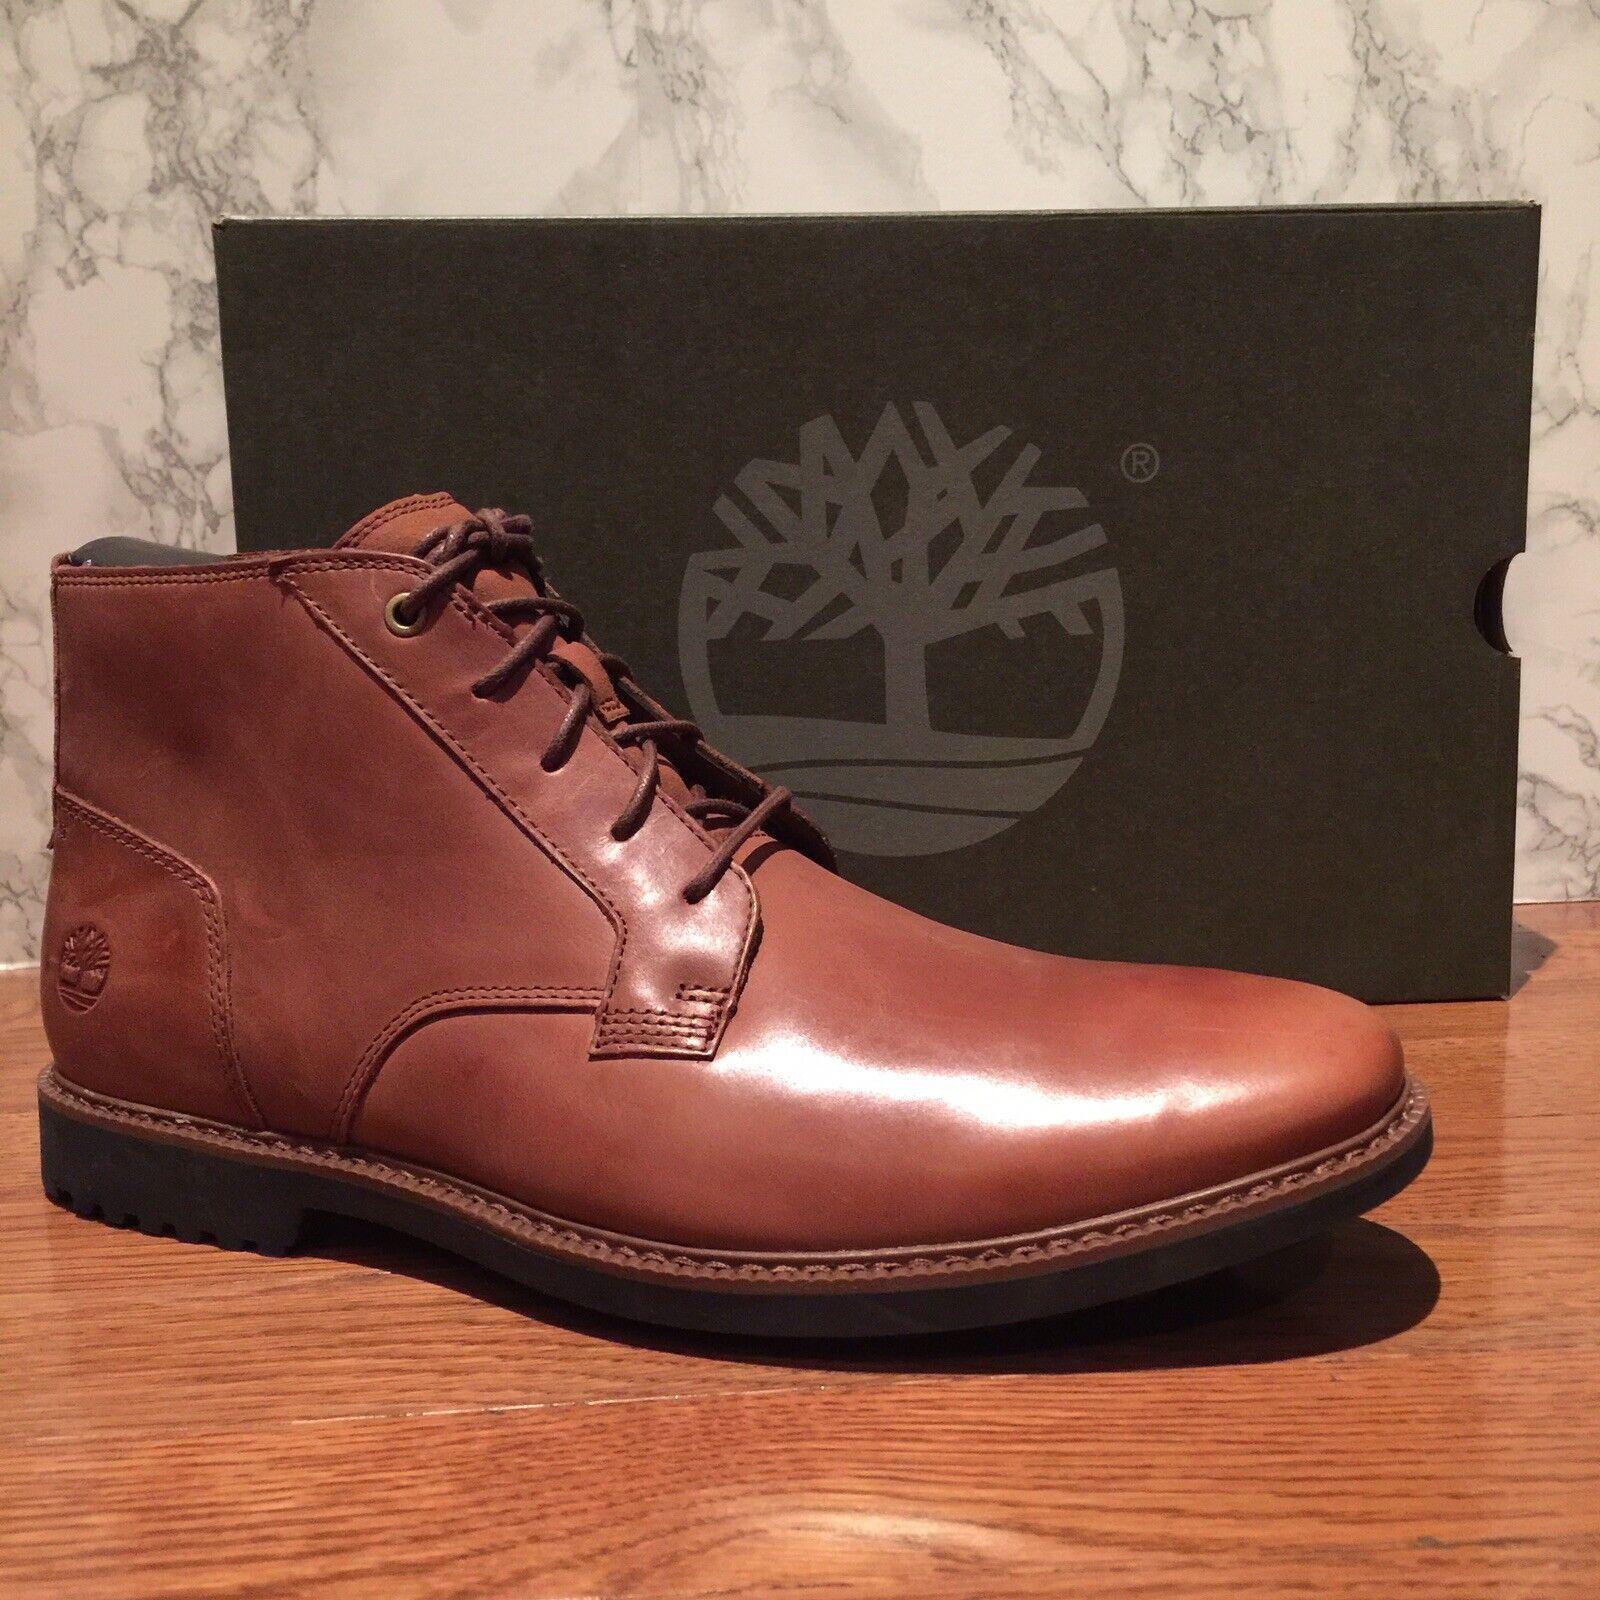 Timberland Men's Lafayette Park Men's Premium Chukka Boot Shoes A1QE2. SZ:10 1